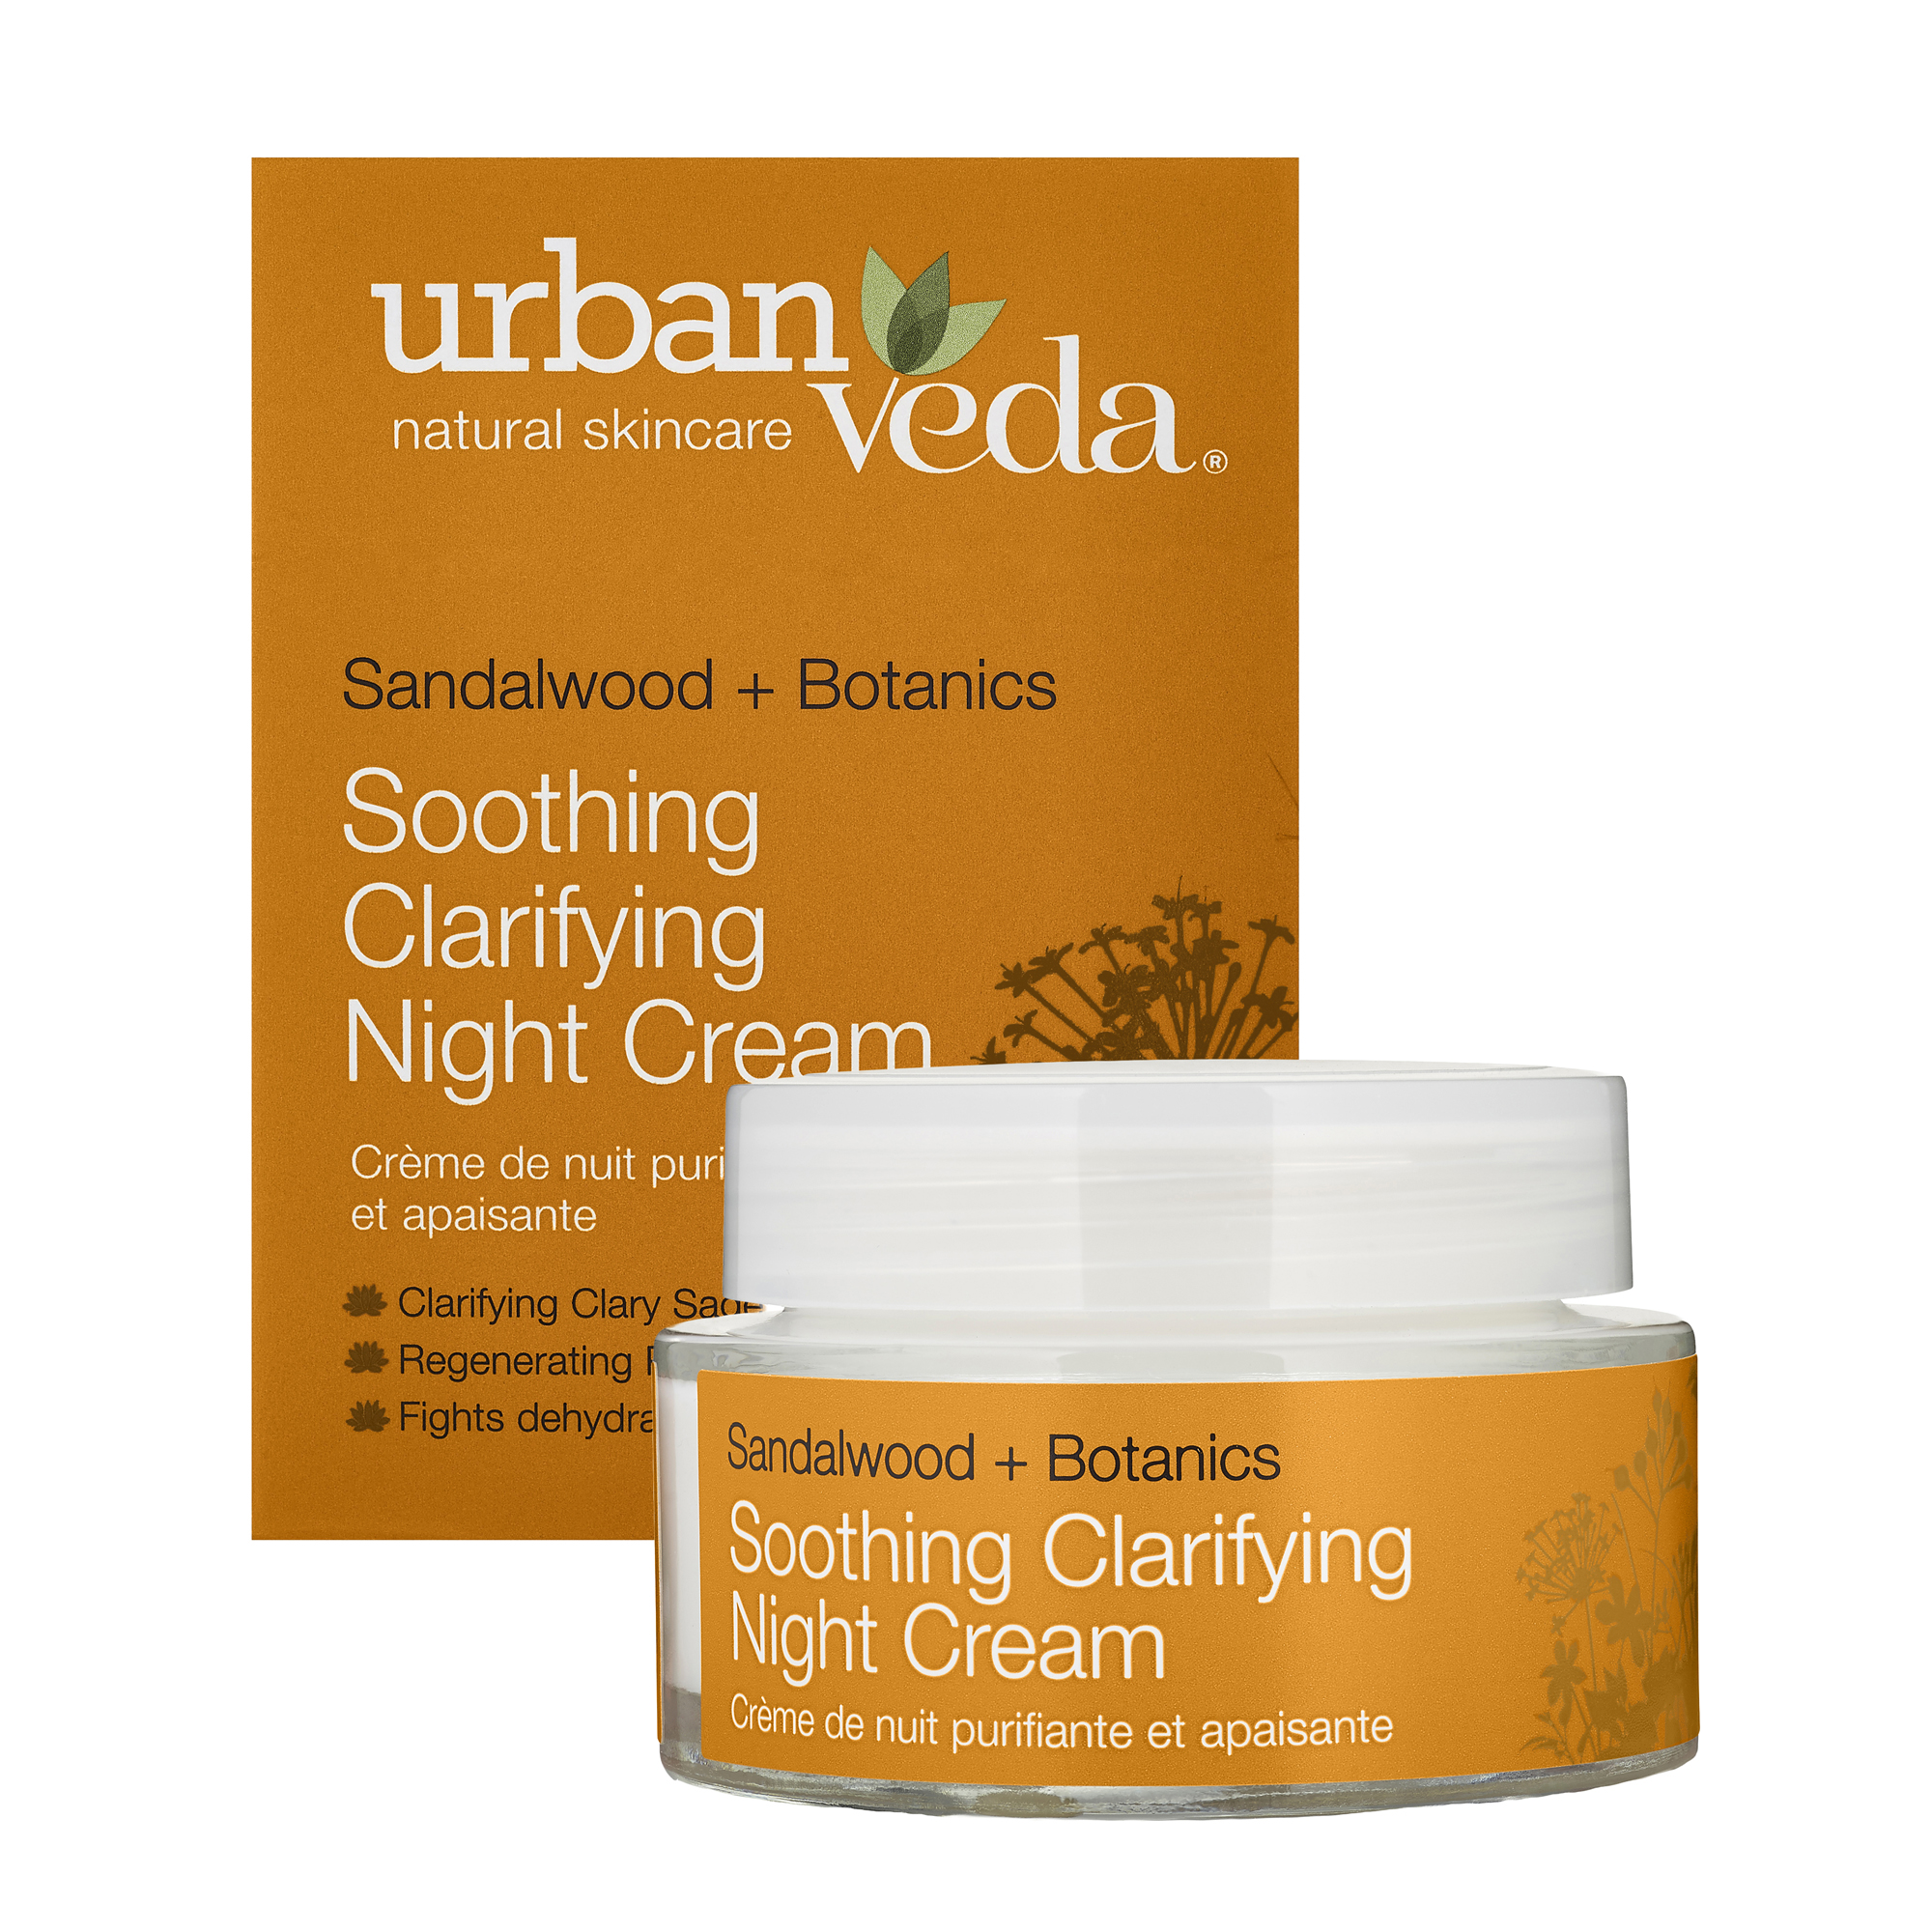 Urban Veda | Urban Veda Soothing Sandalwood Clarifying Night Cream, 50ml